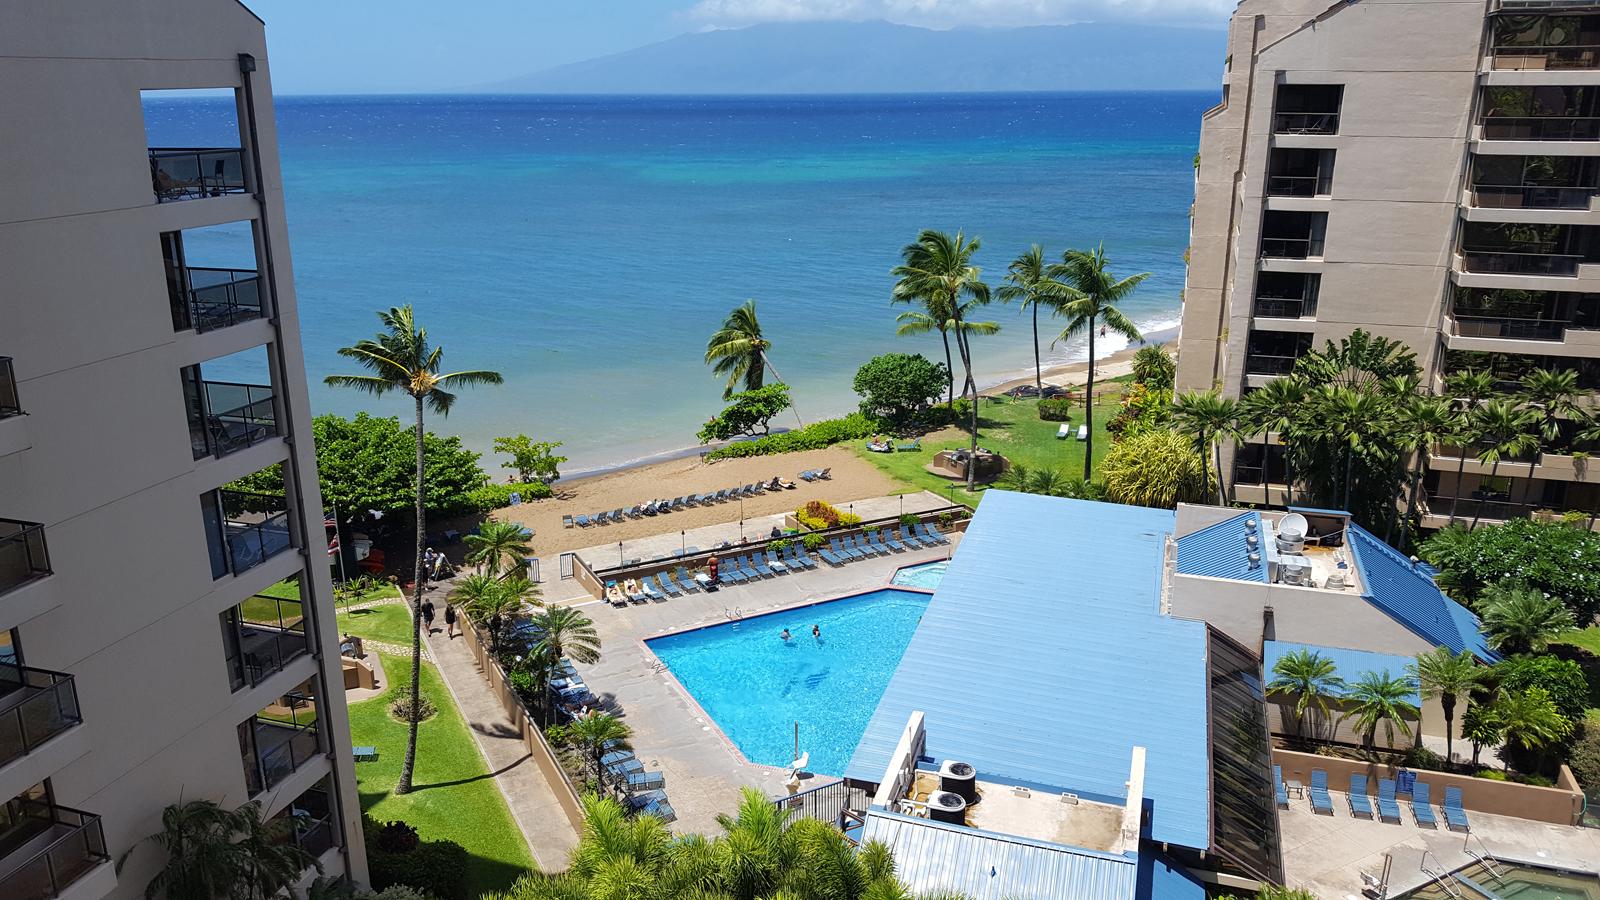 Sands of Kahana Maui HI  rent one for me